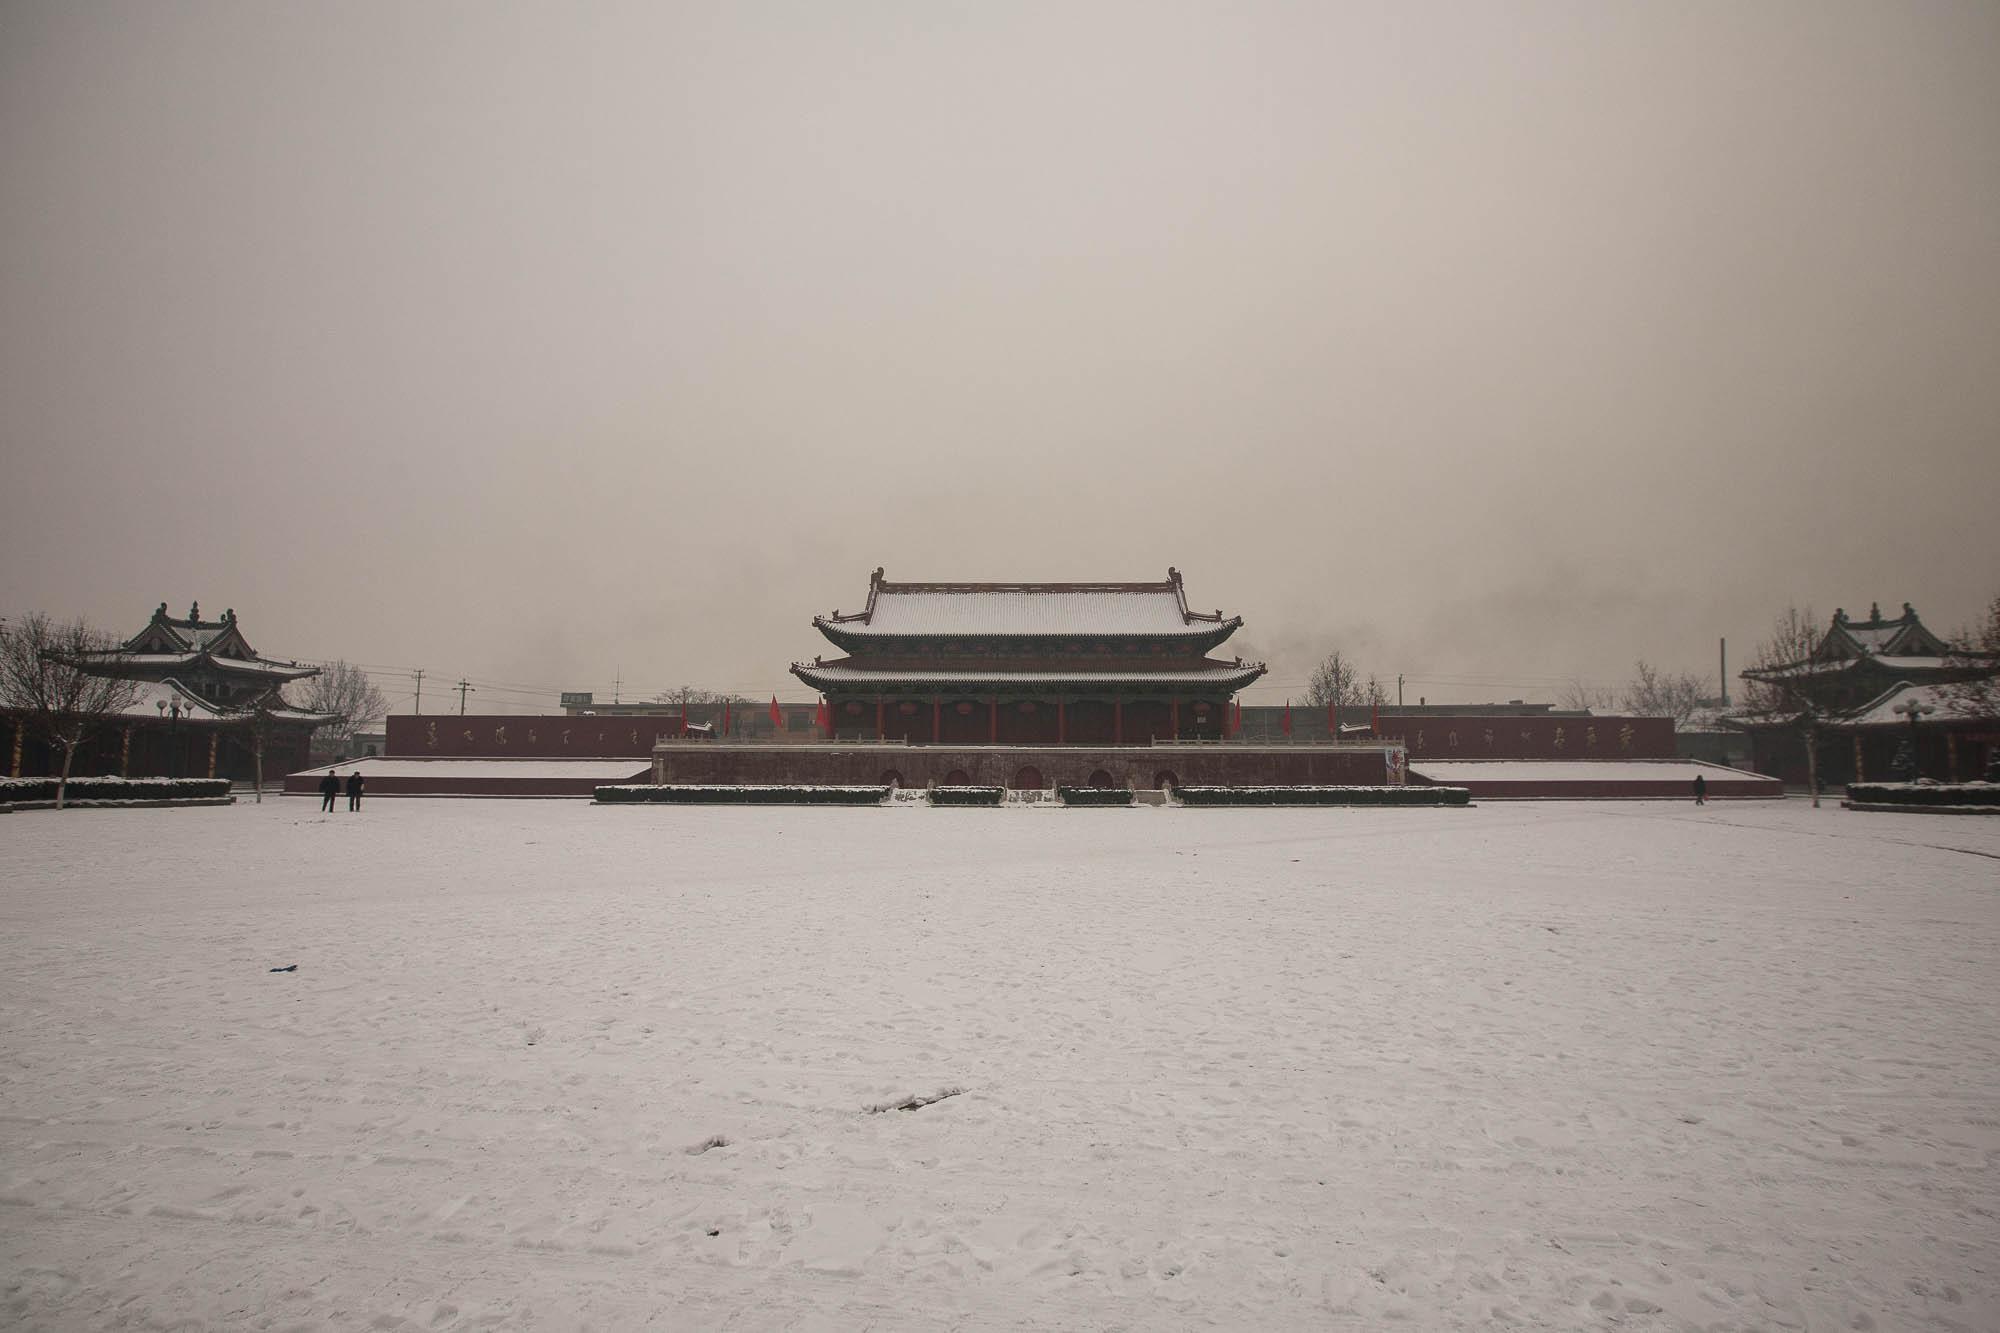 Yao Temple